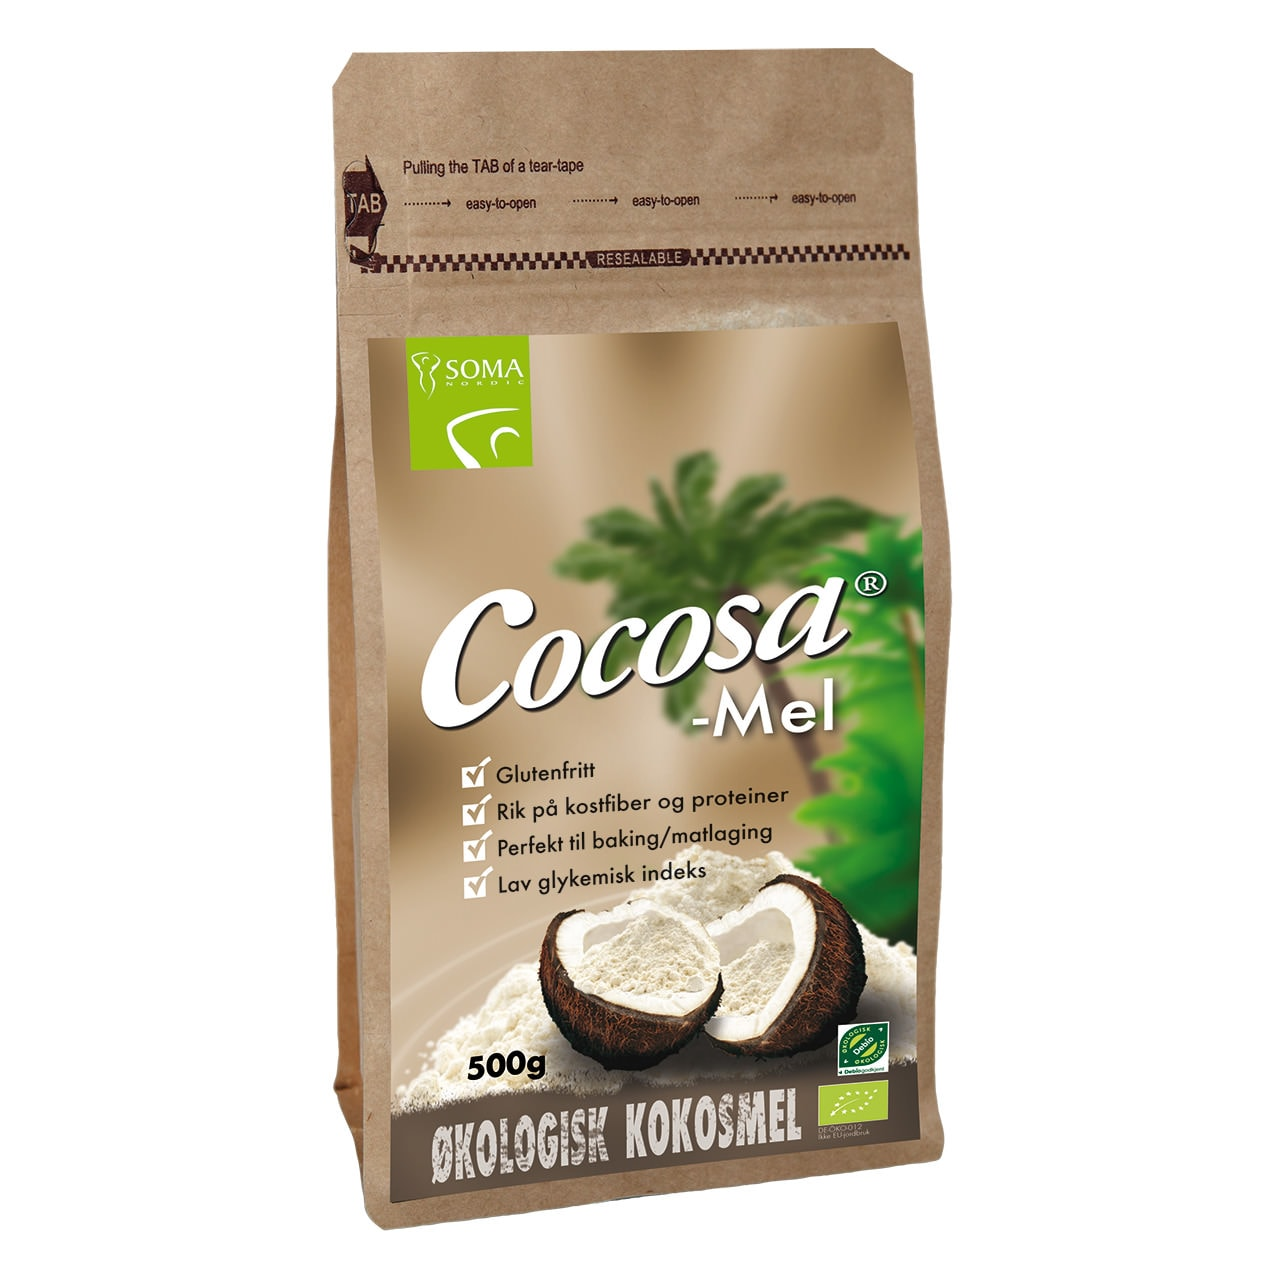 Cocosa Mel